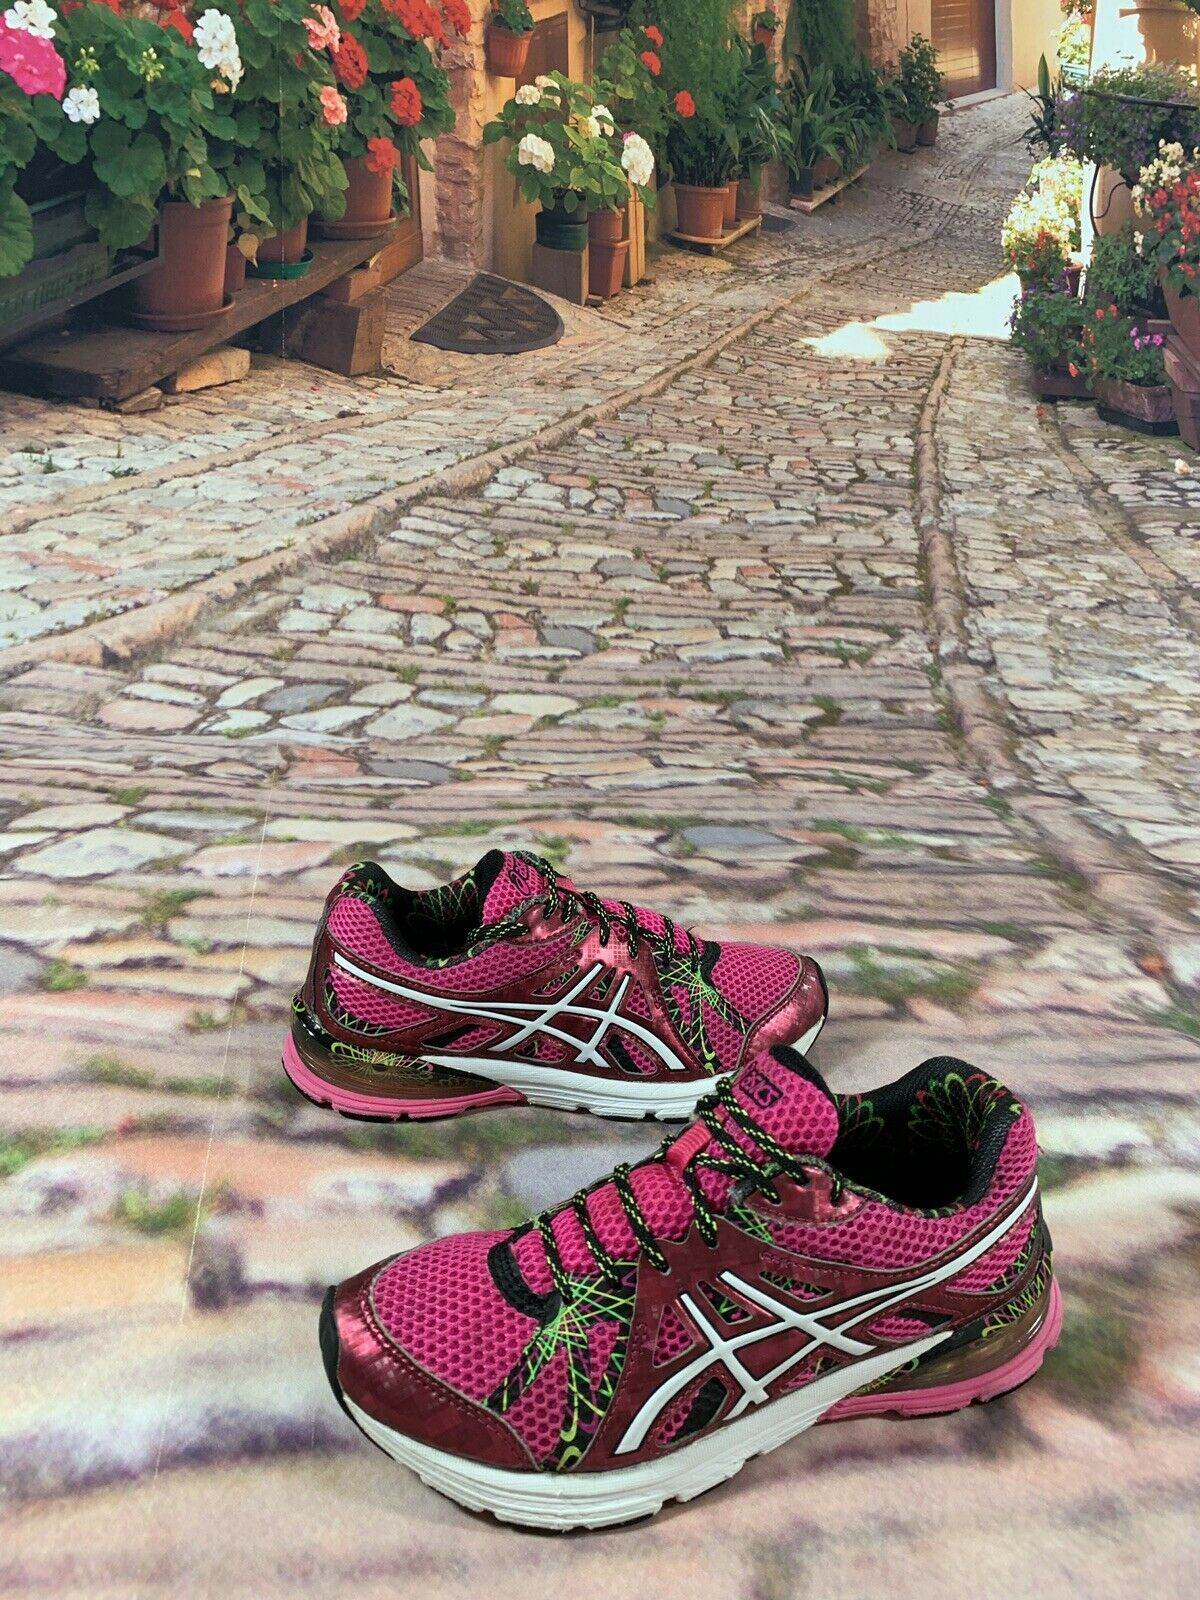 ASICS GEL PRELEUS HOT-PINK Women's Running shoes - Sz 6  T480N